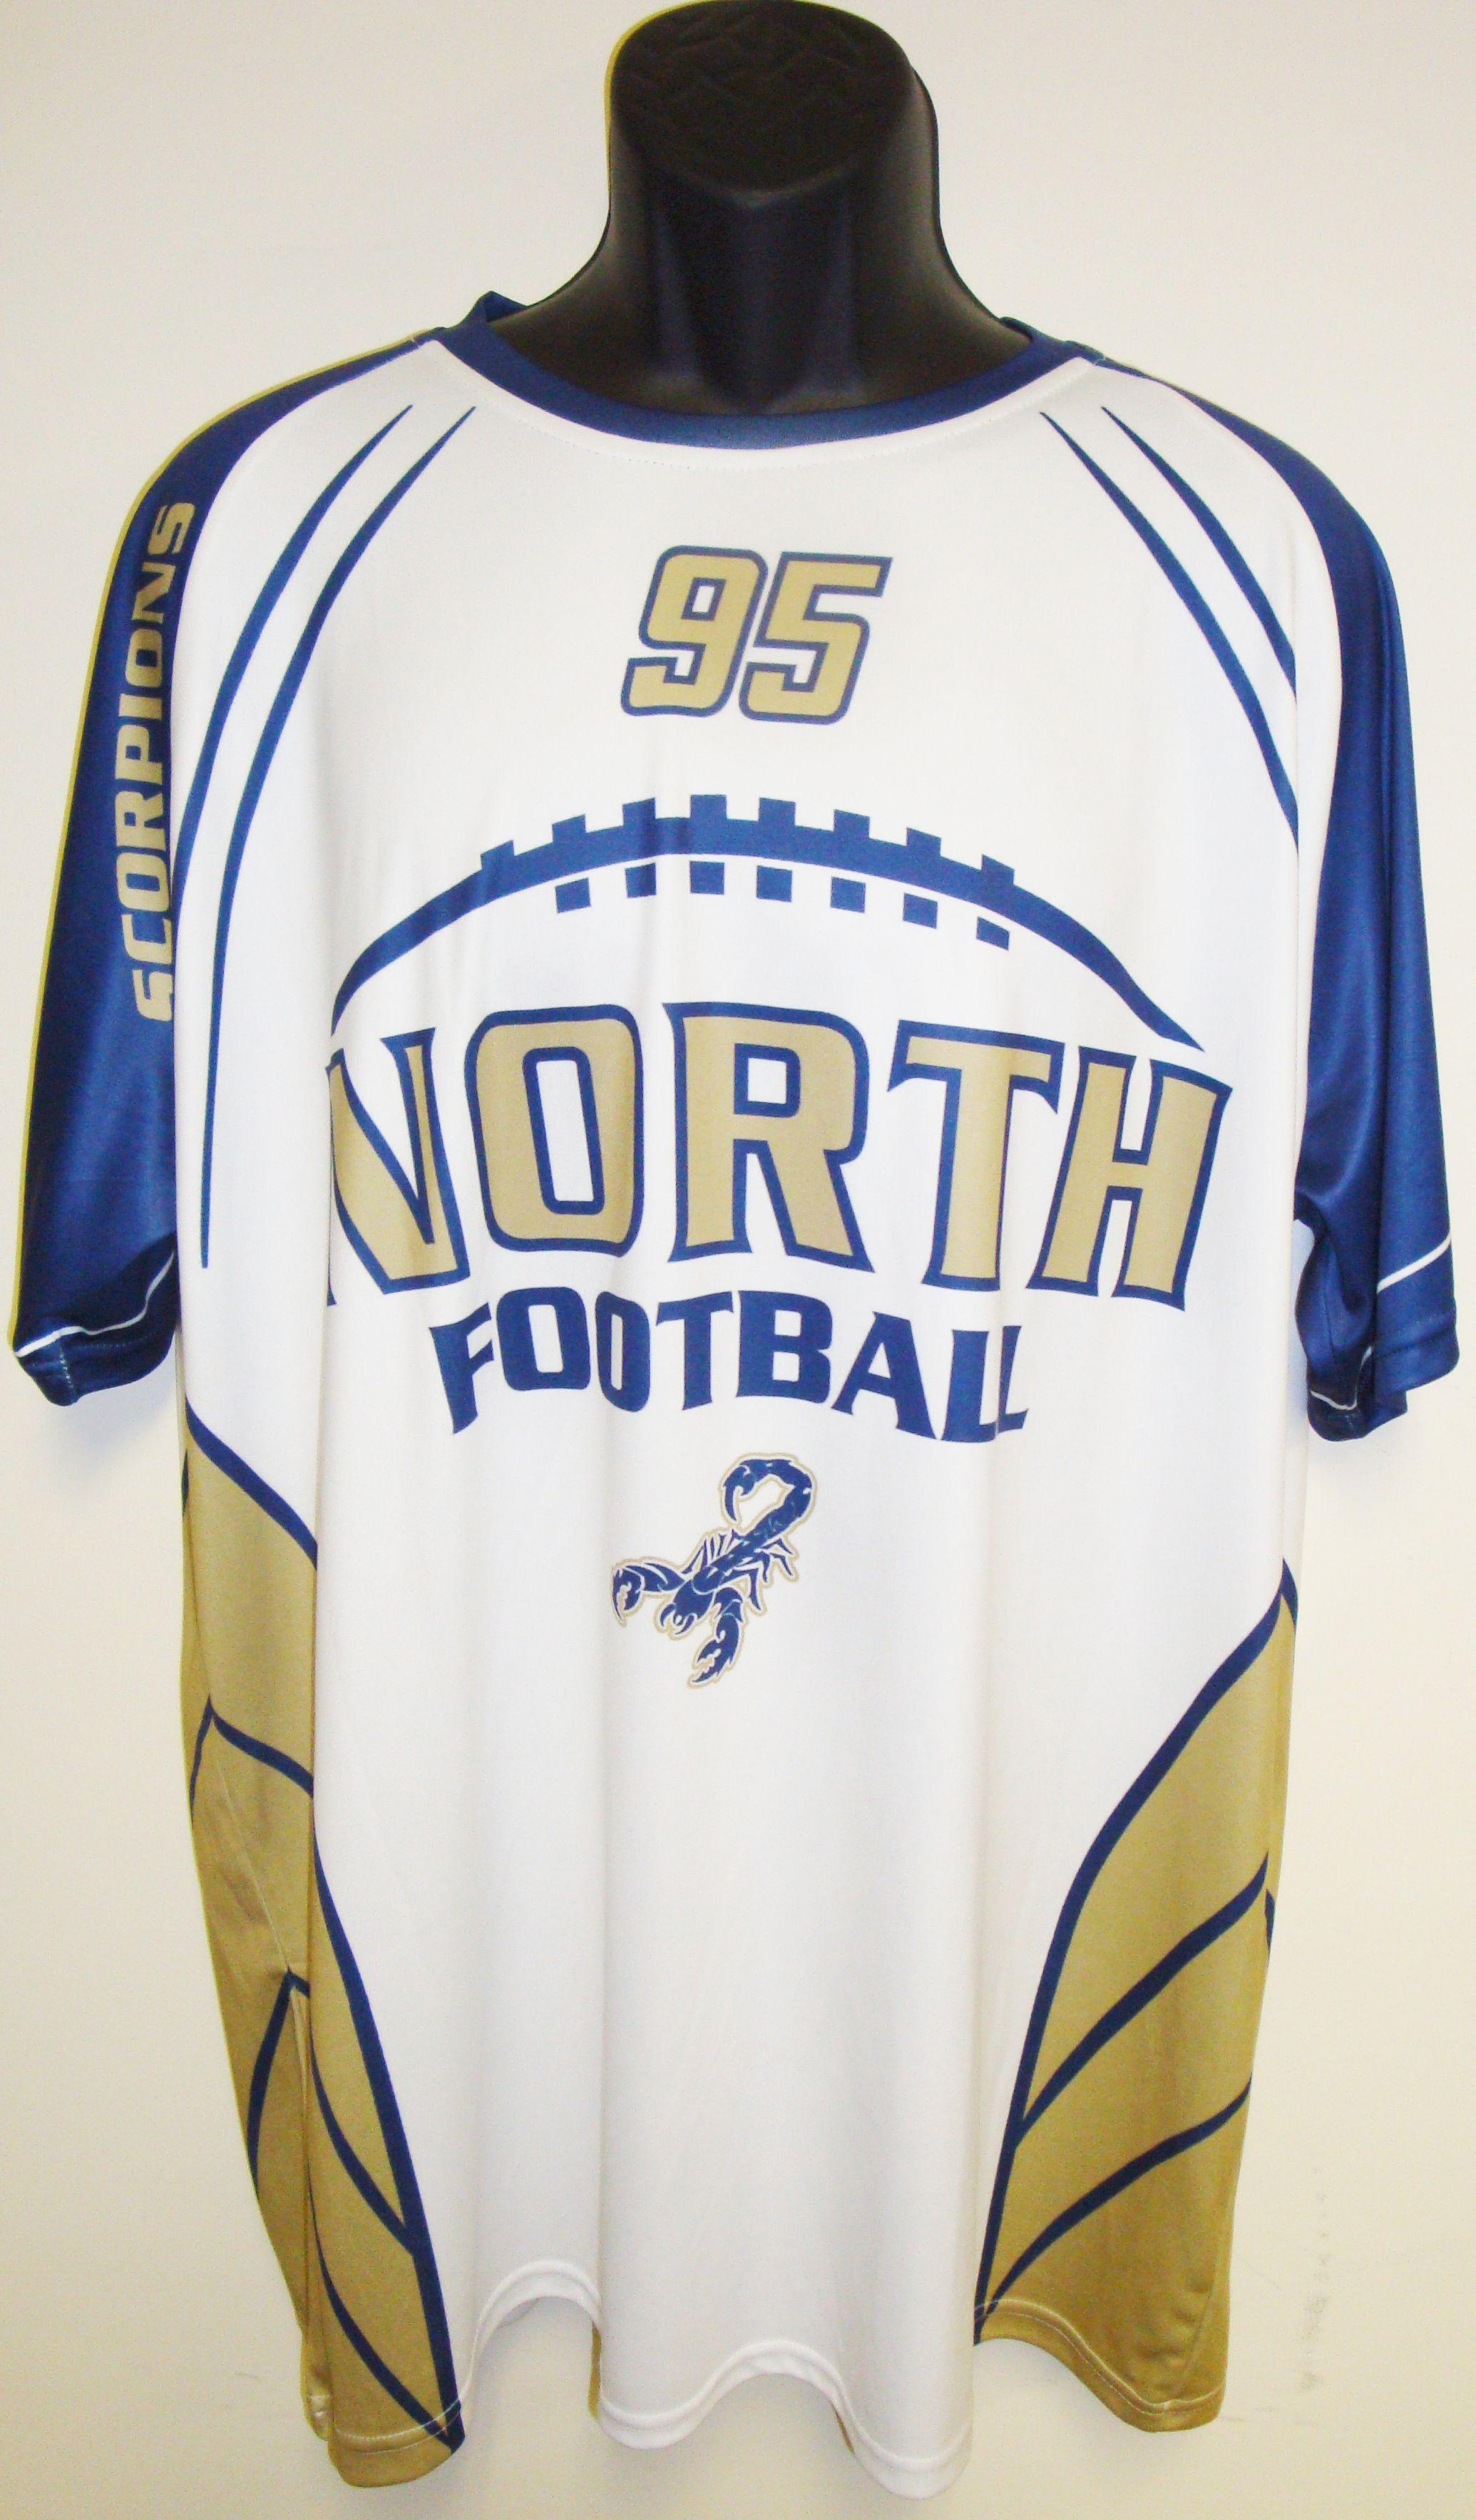 North Brunswick Hs Football Nc Product Gallery Hs Football